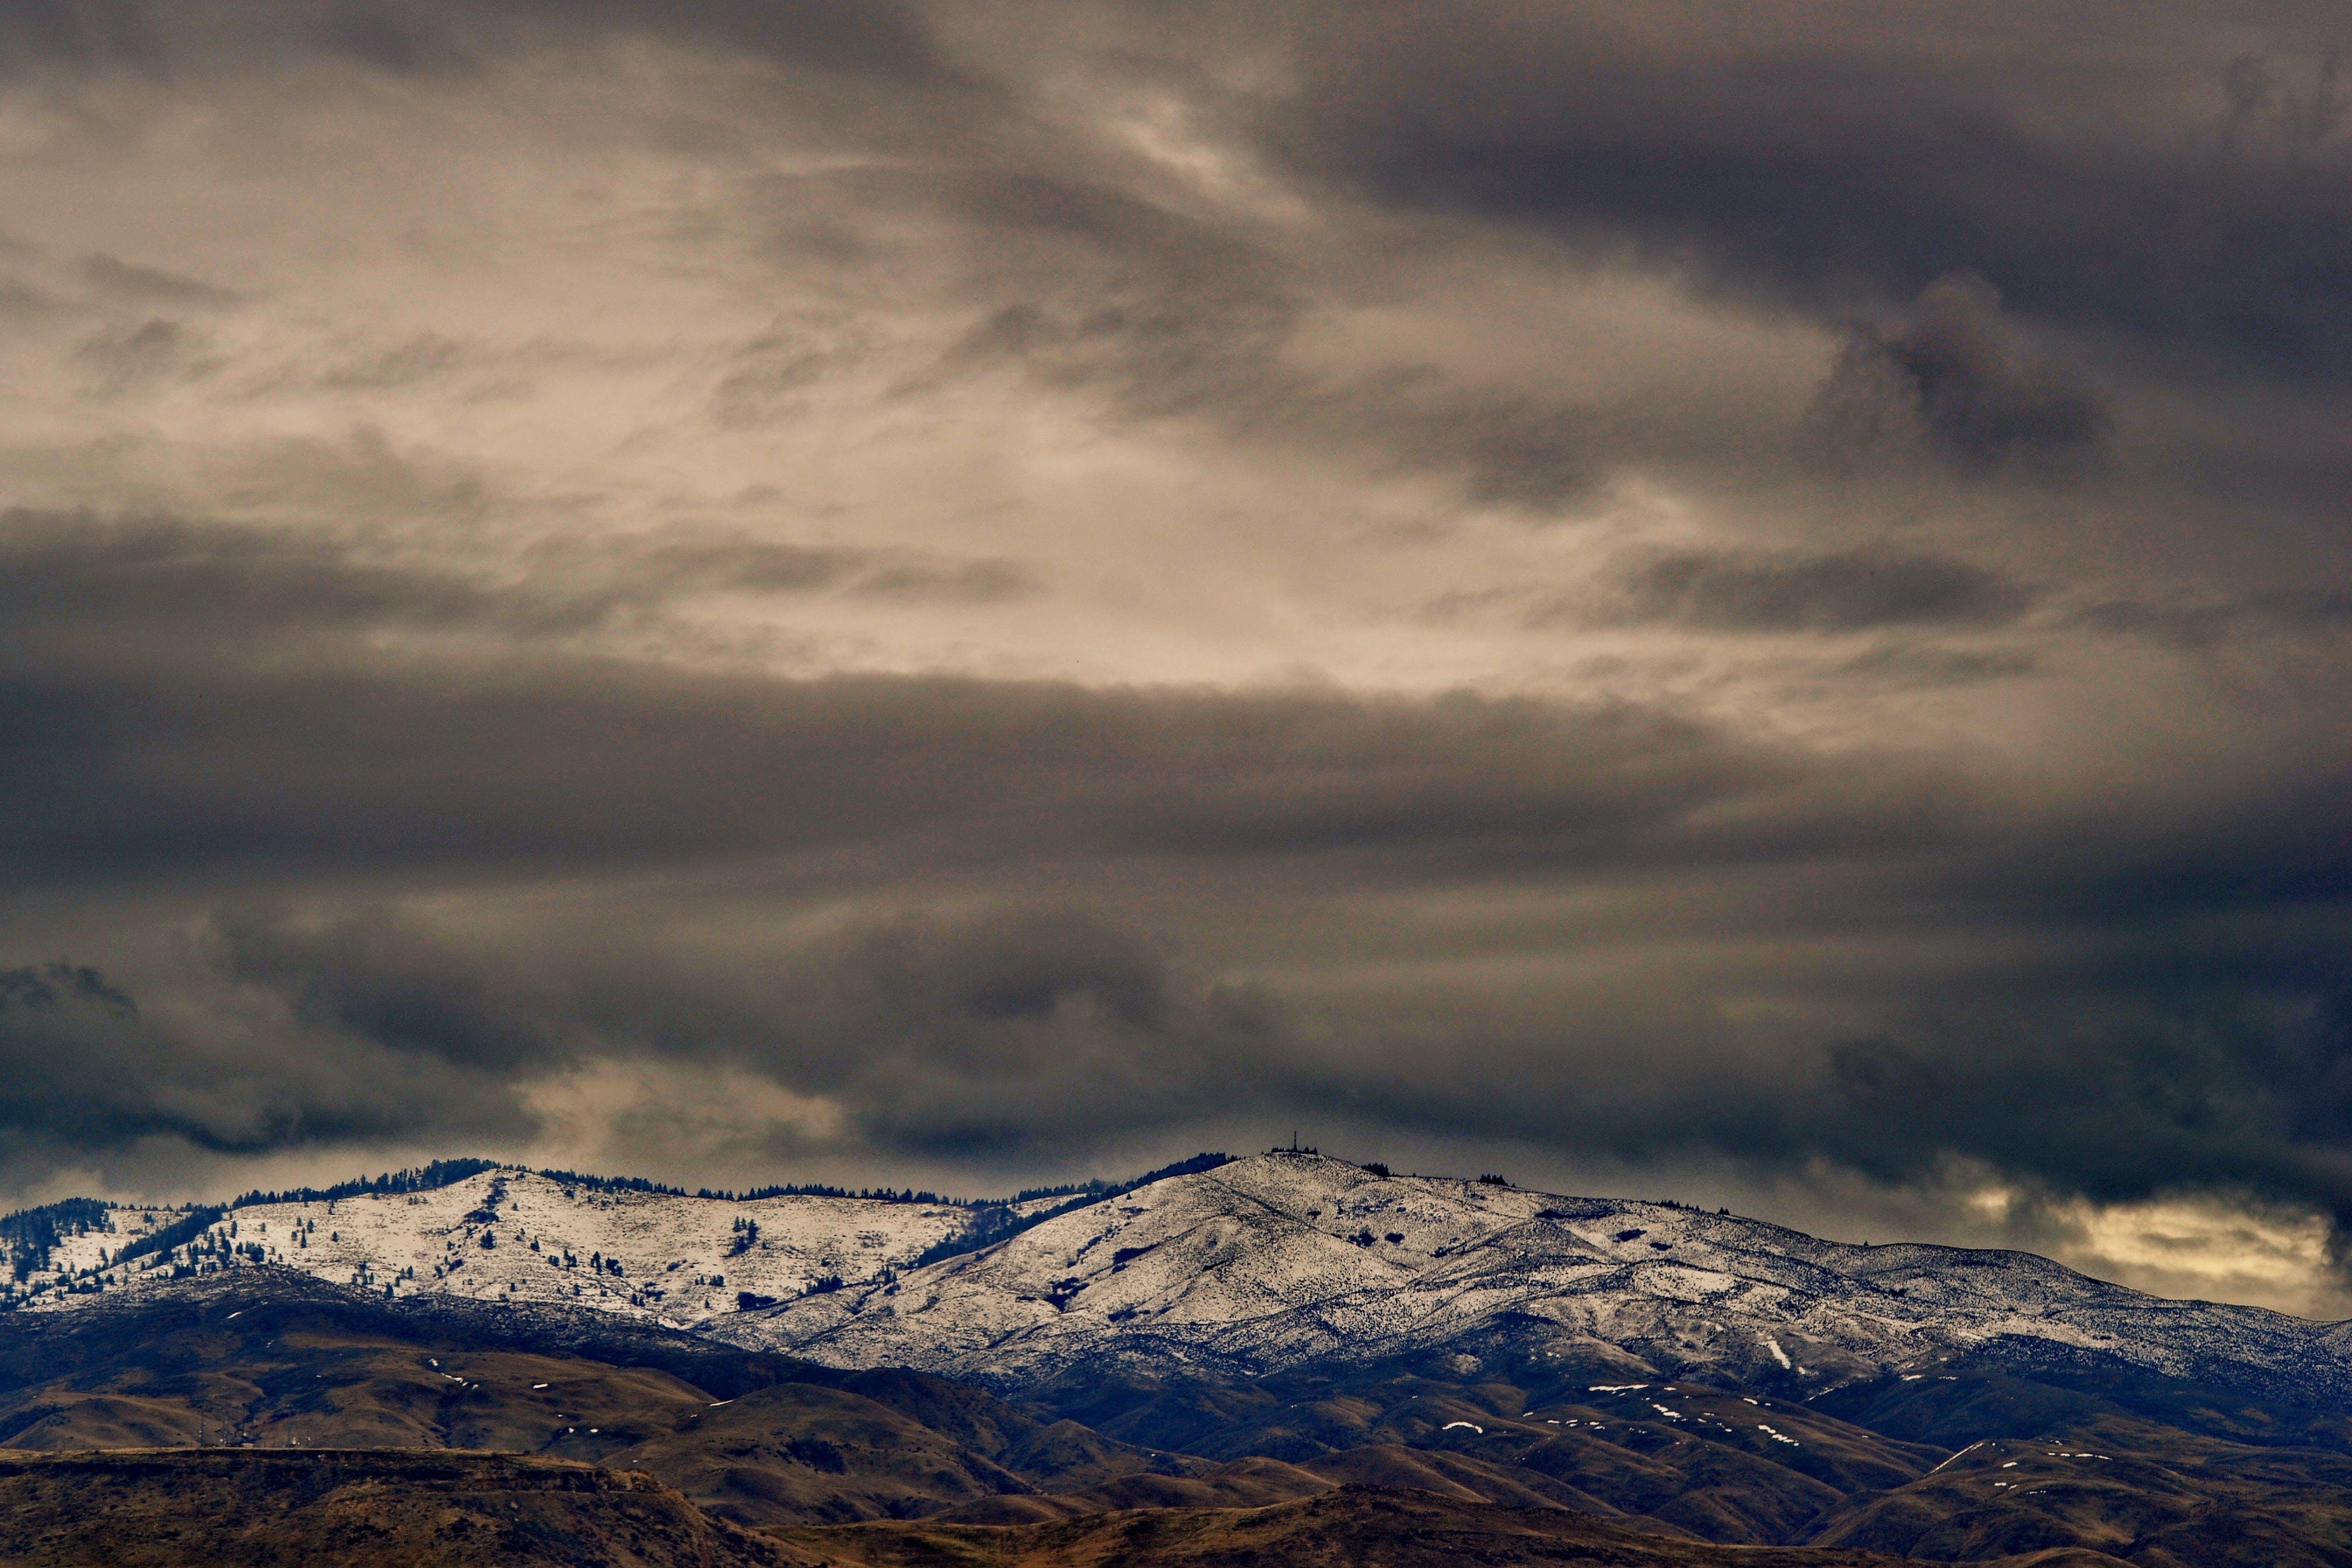 Landscape Photo of White Mountain